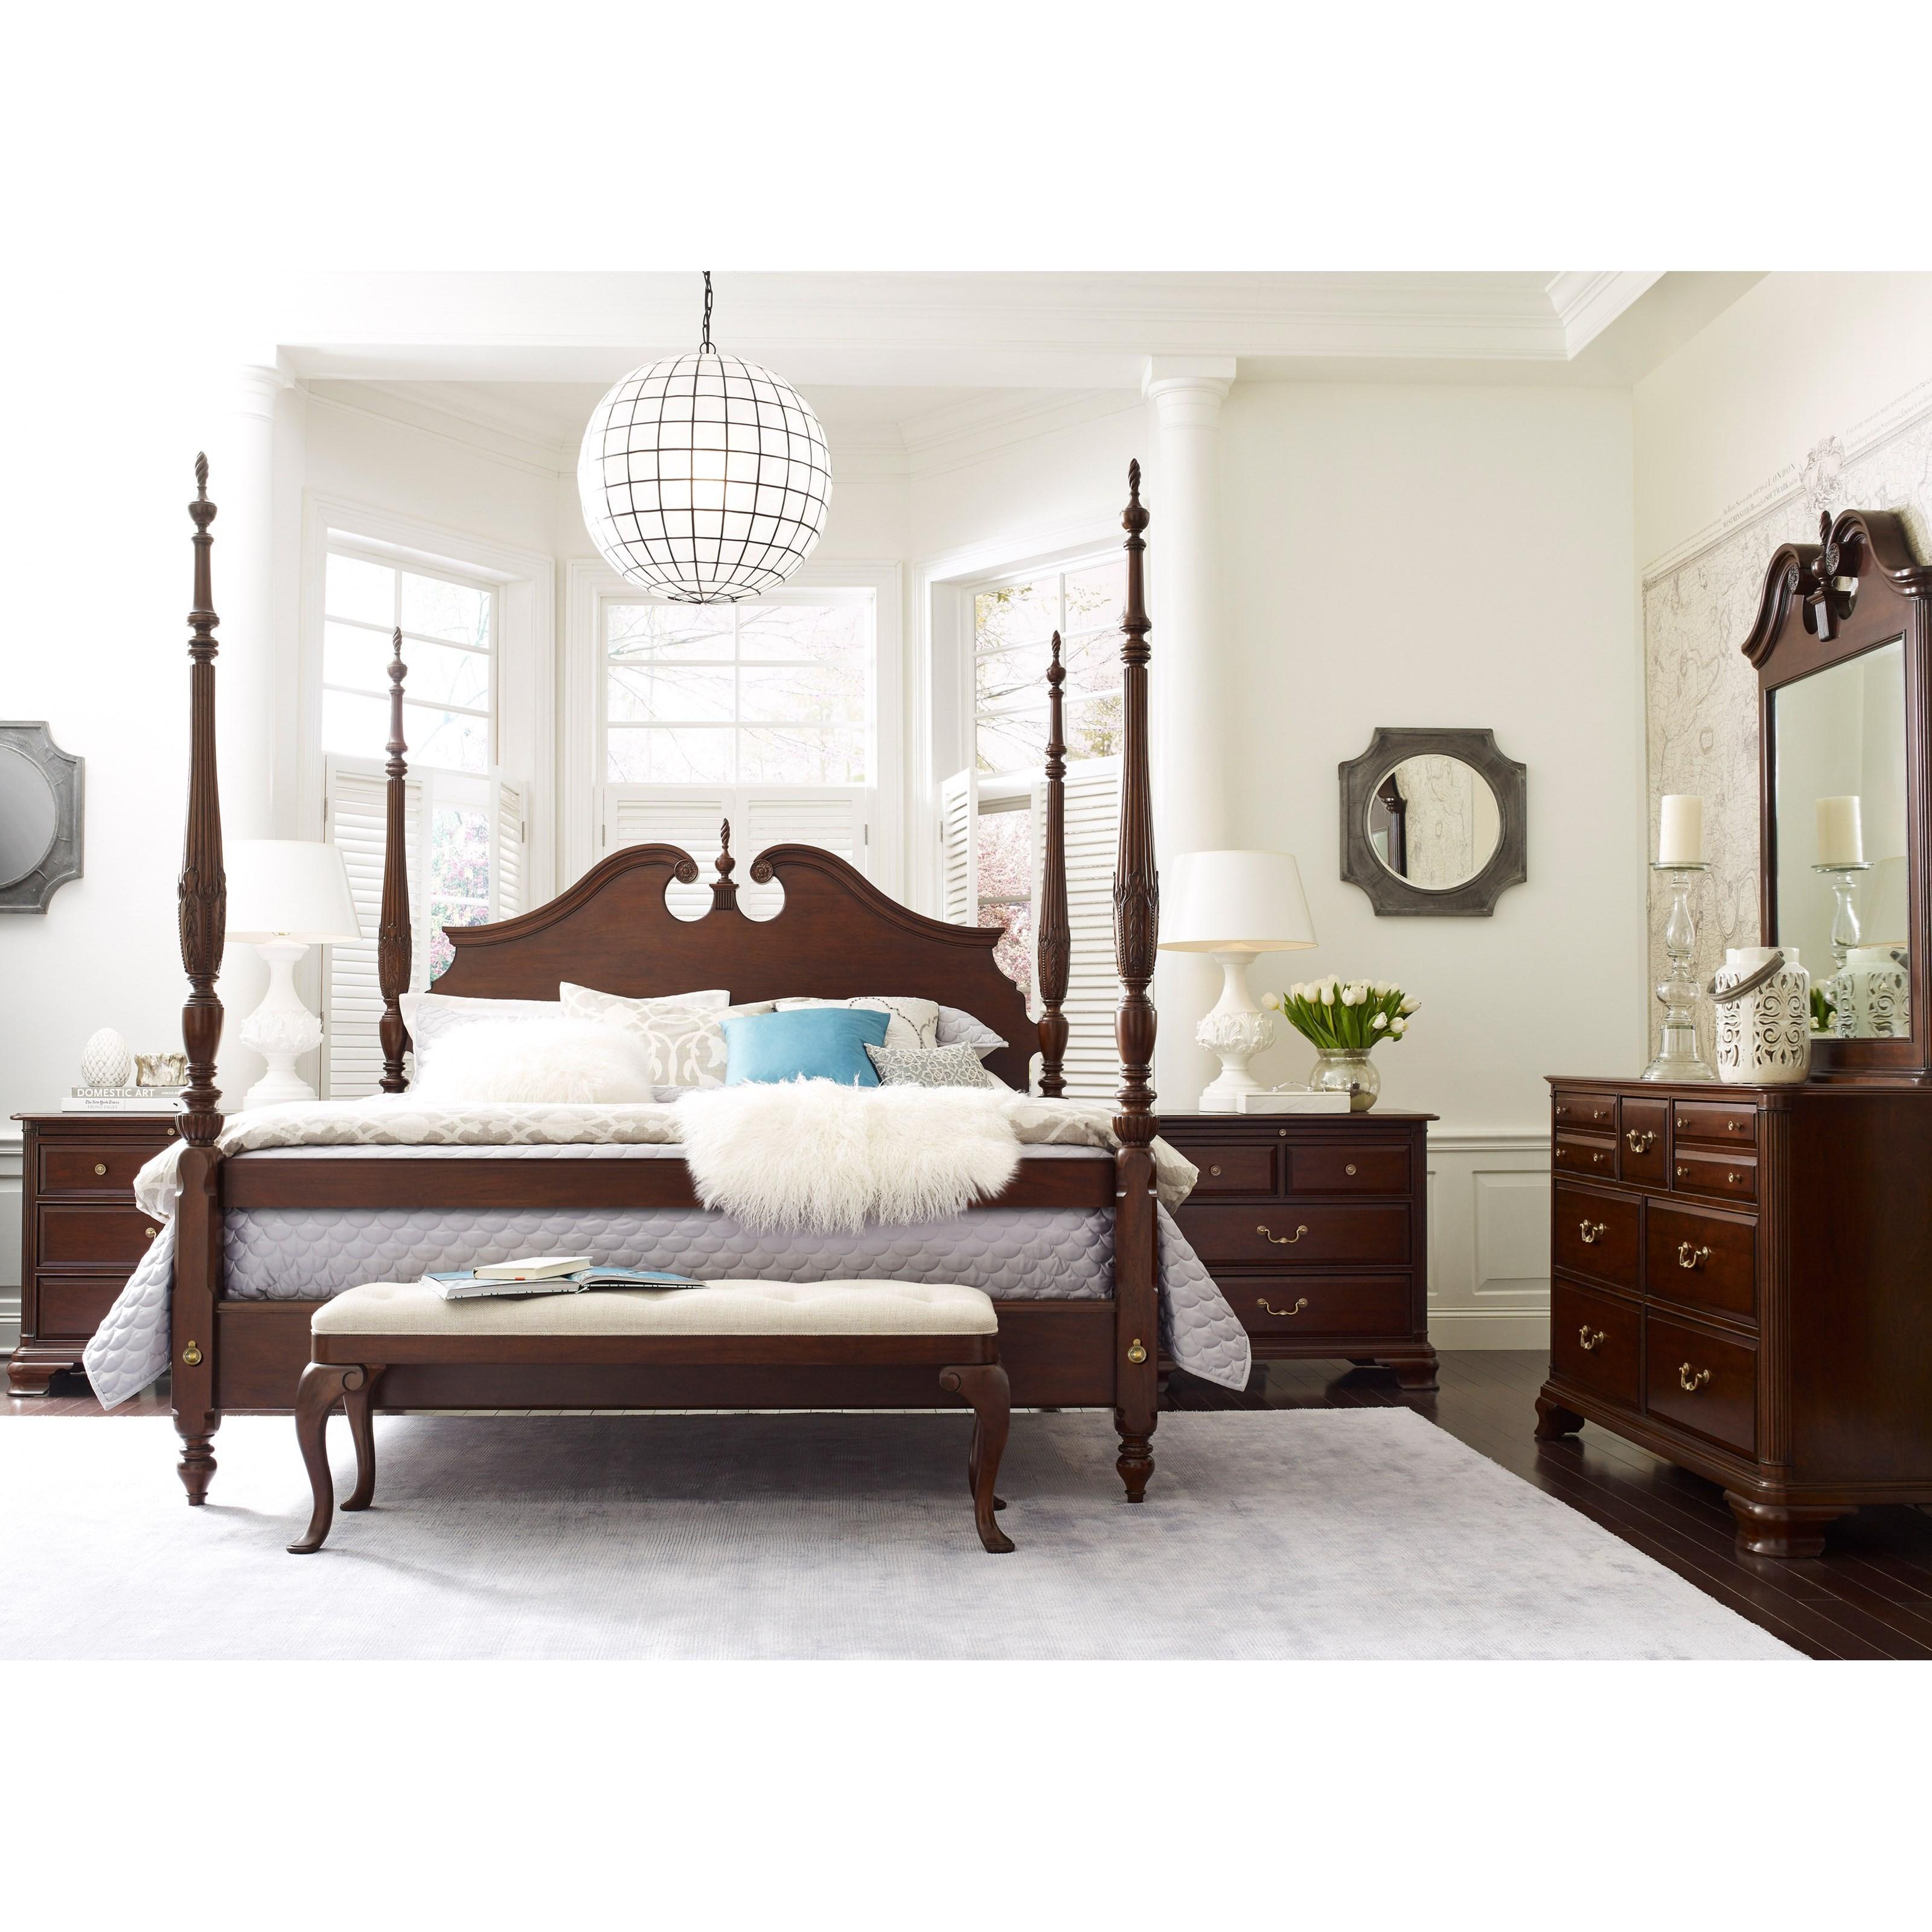 kincaid furniture hadleigh queen bedroom group hudson 39 s furniture bedroom groups